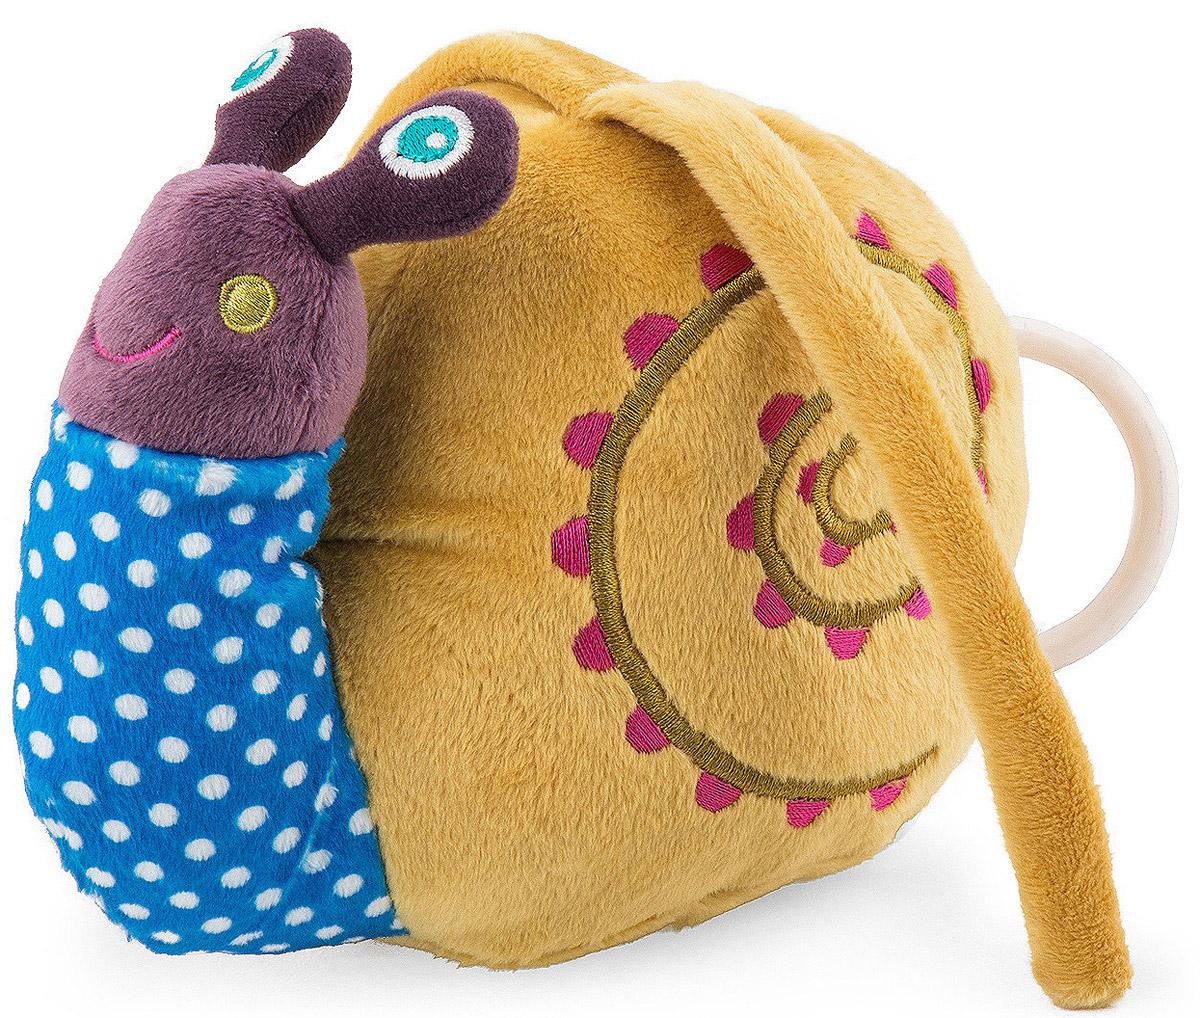 Oops Музыкальная игрушка-подвеска Улитка мягкие игрушки oops игрушка развивающая улитка